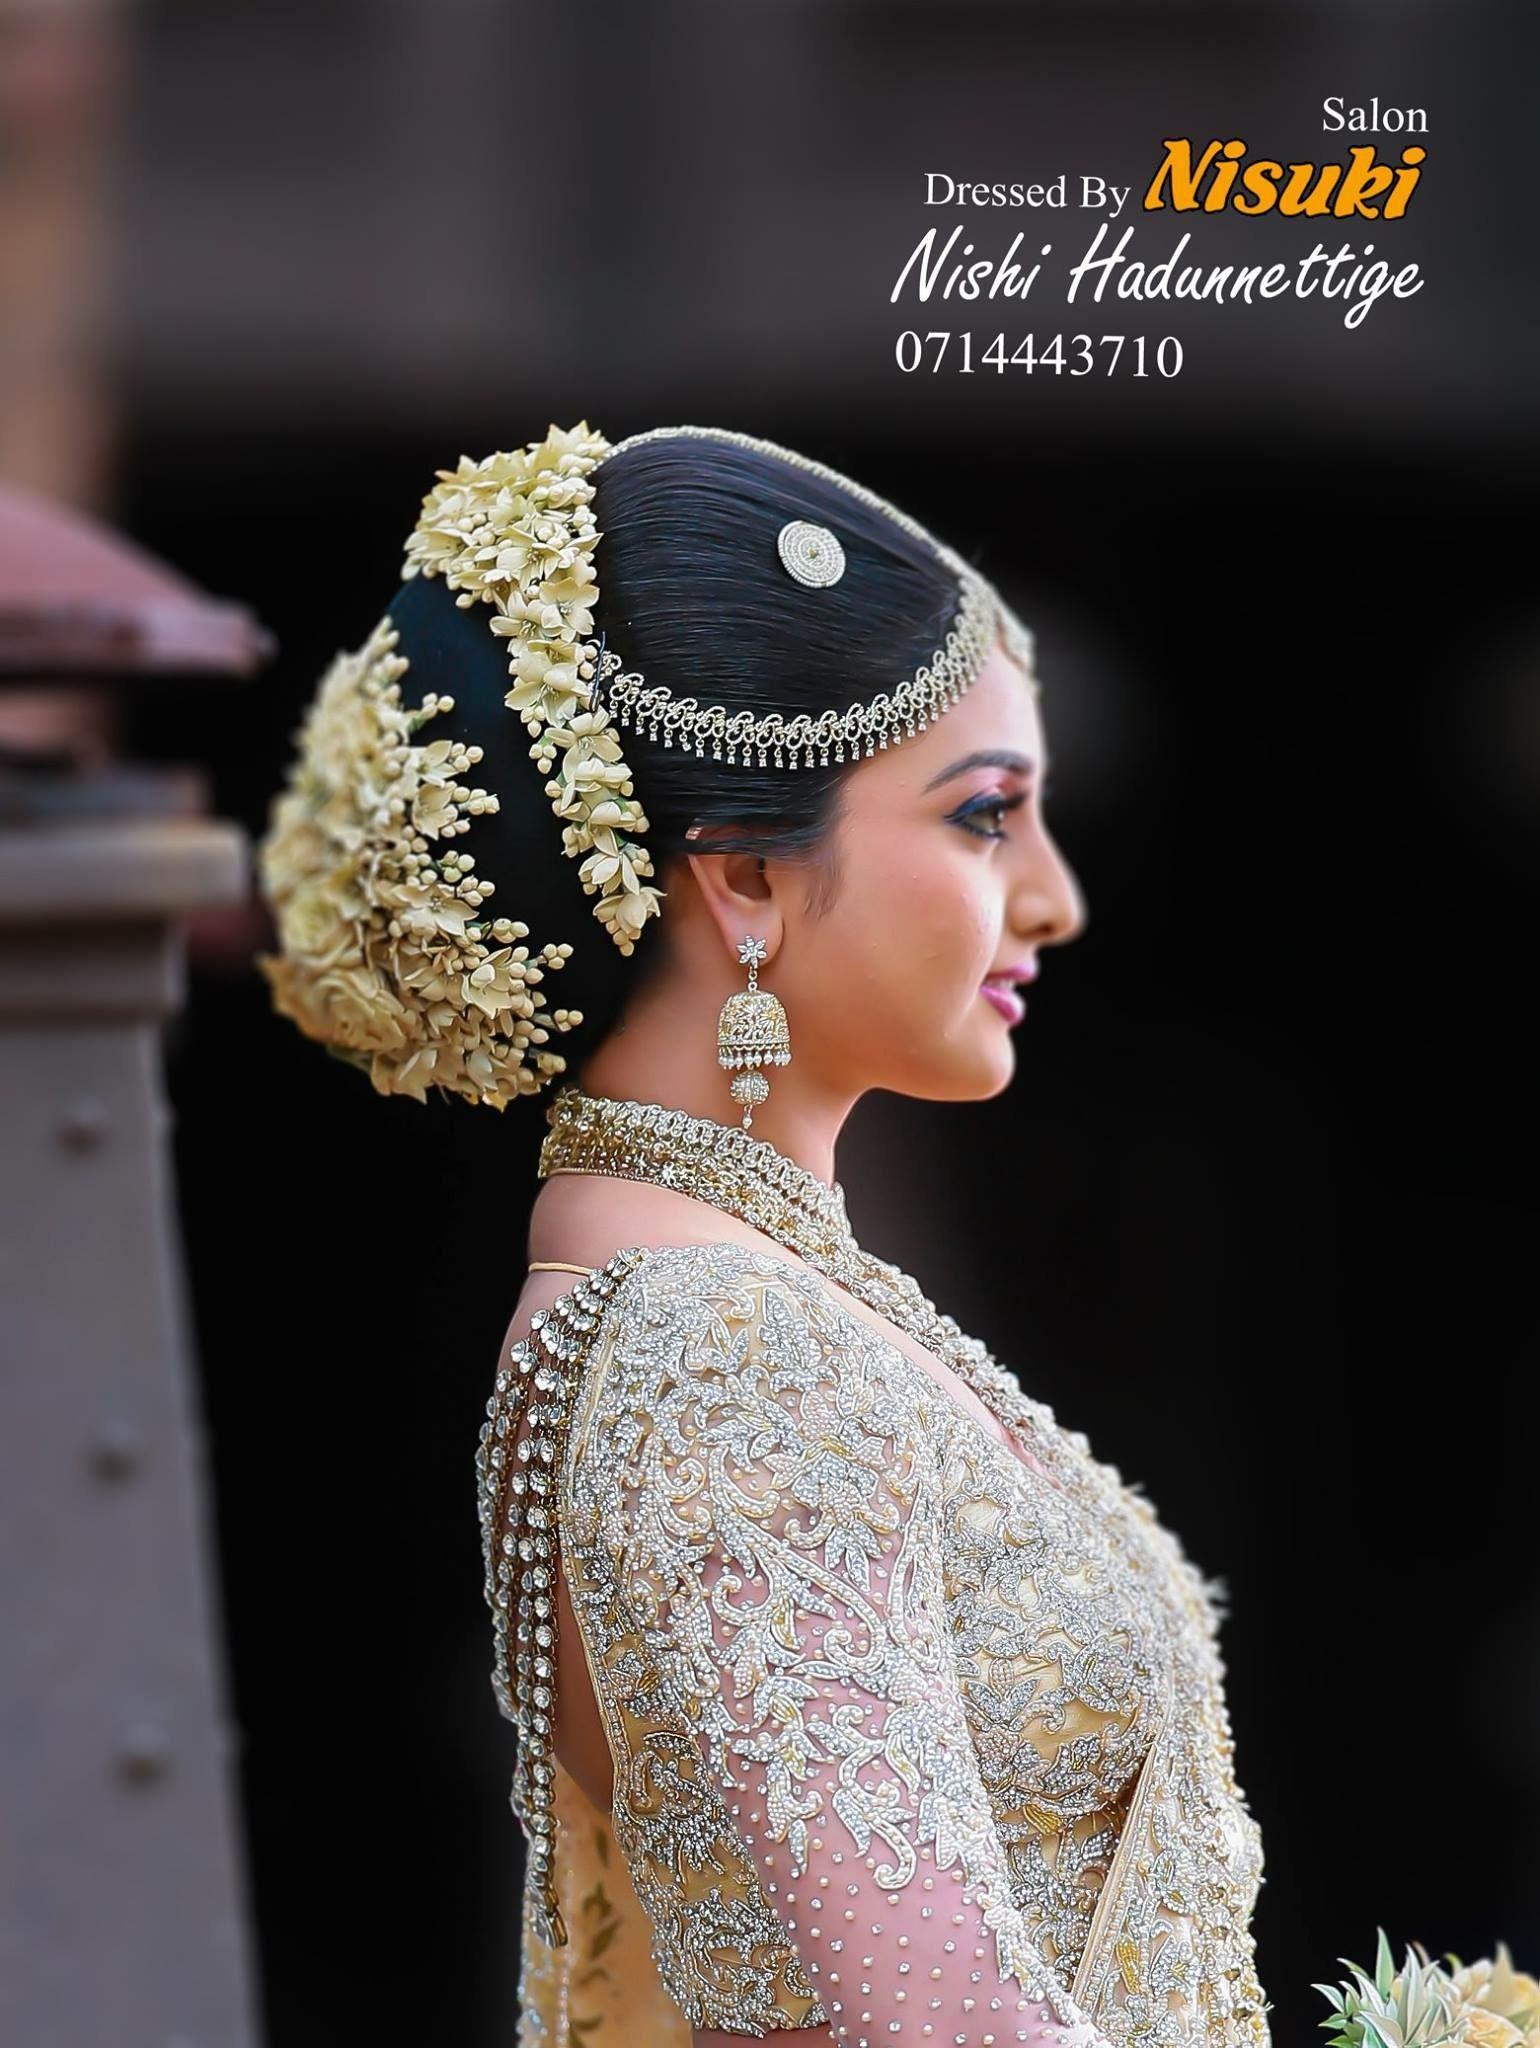 pin by imesha grero on brides in 2019 | bridal sari, wedding